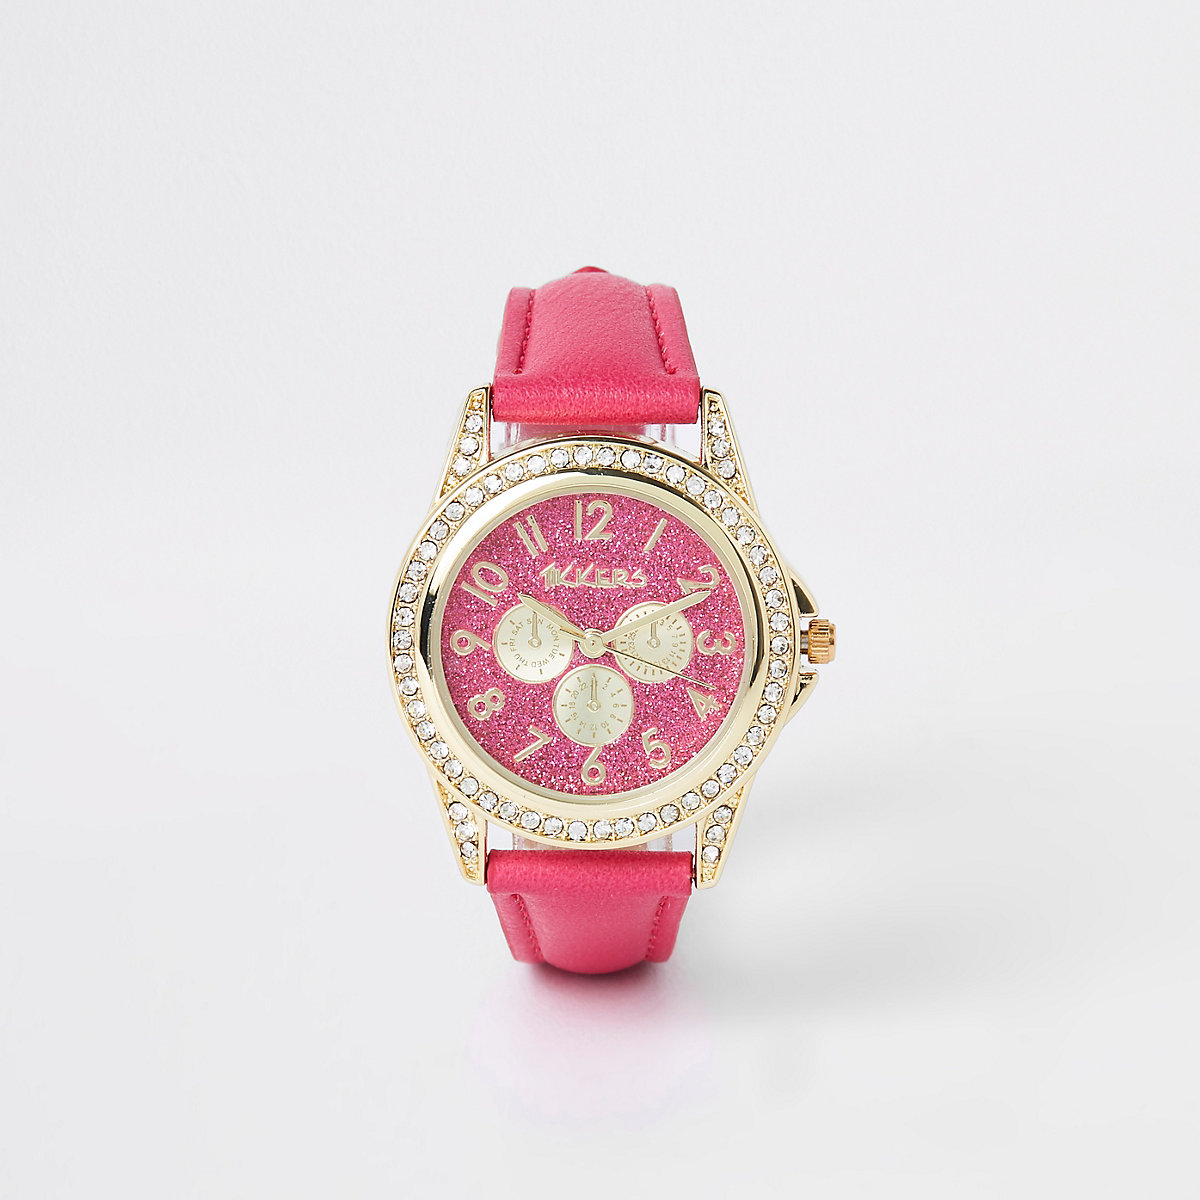 Girls pink rhinestone encrusted watch